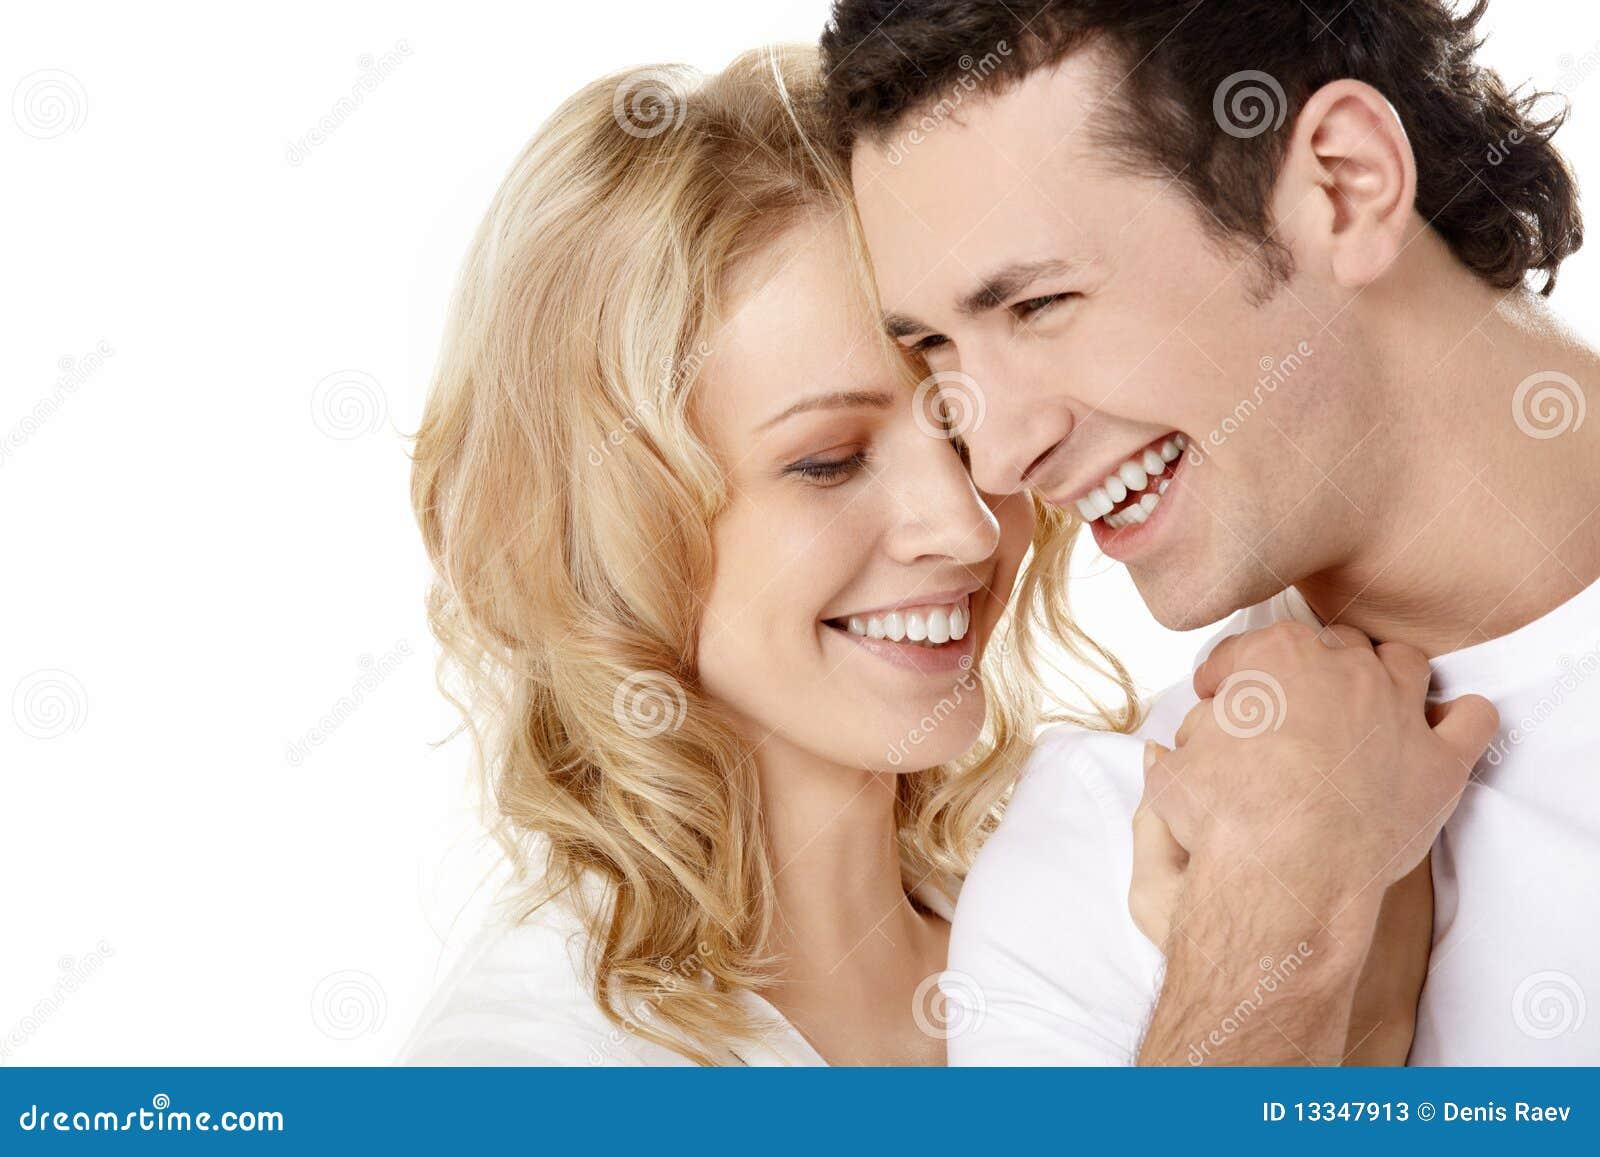 intelligible answer You kochkurse für singles in mannheim apologise, but